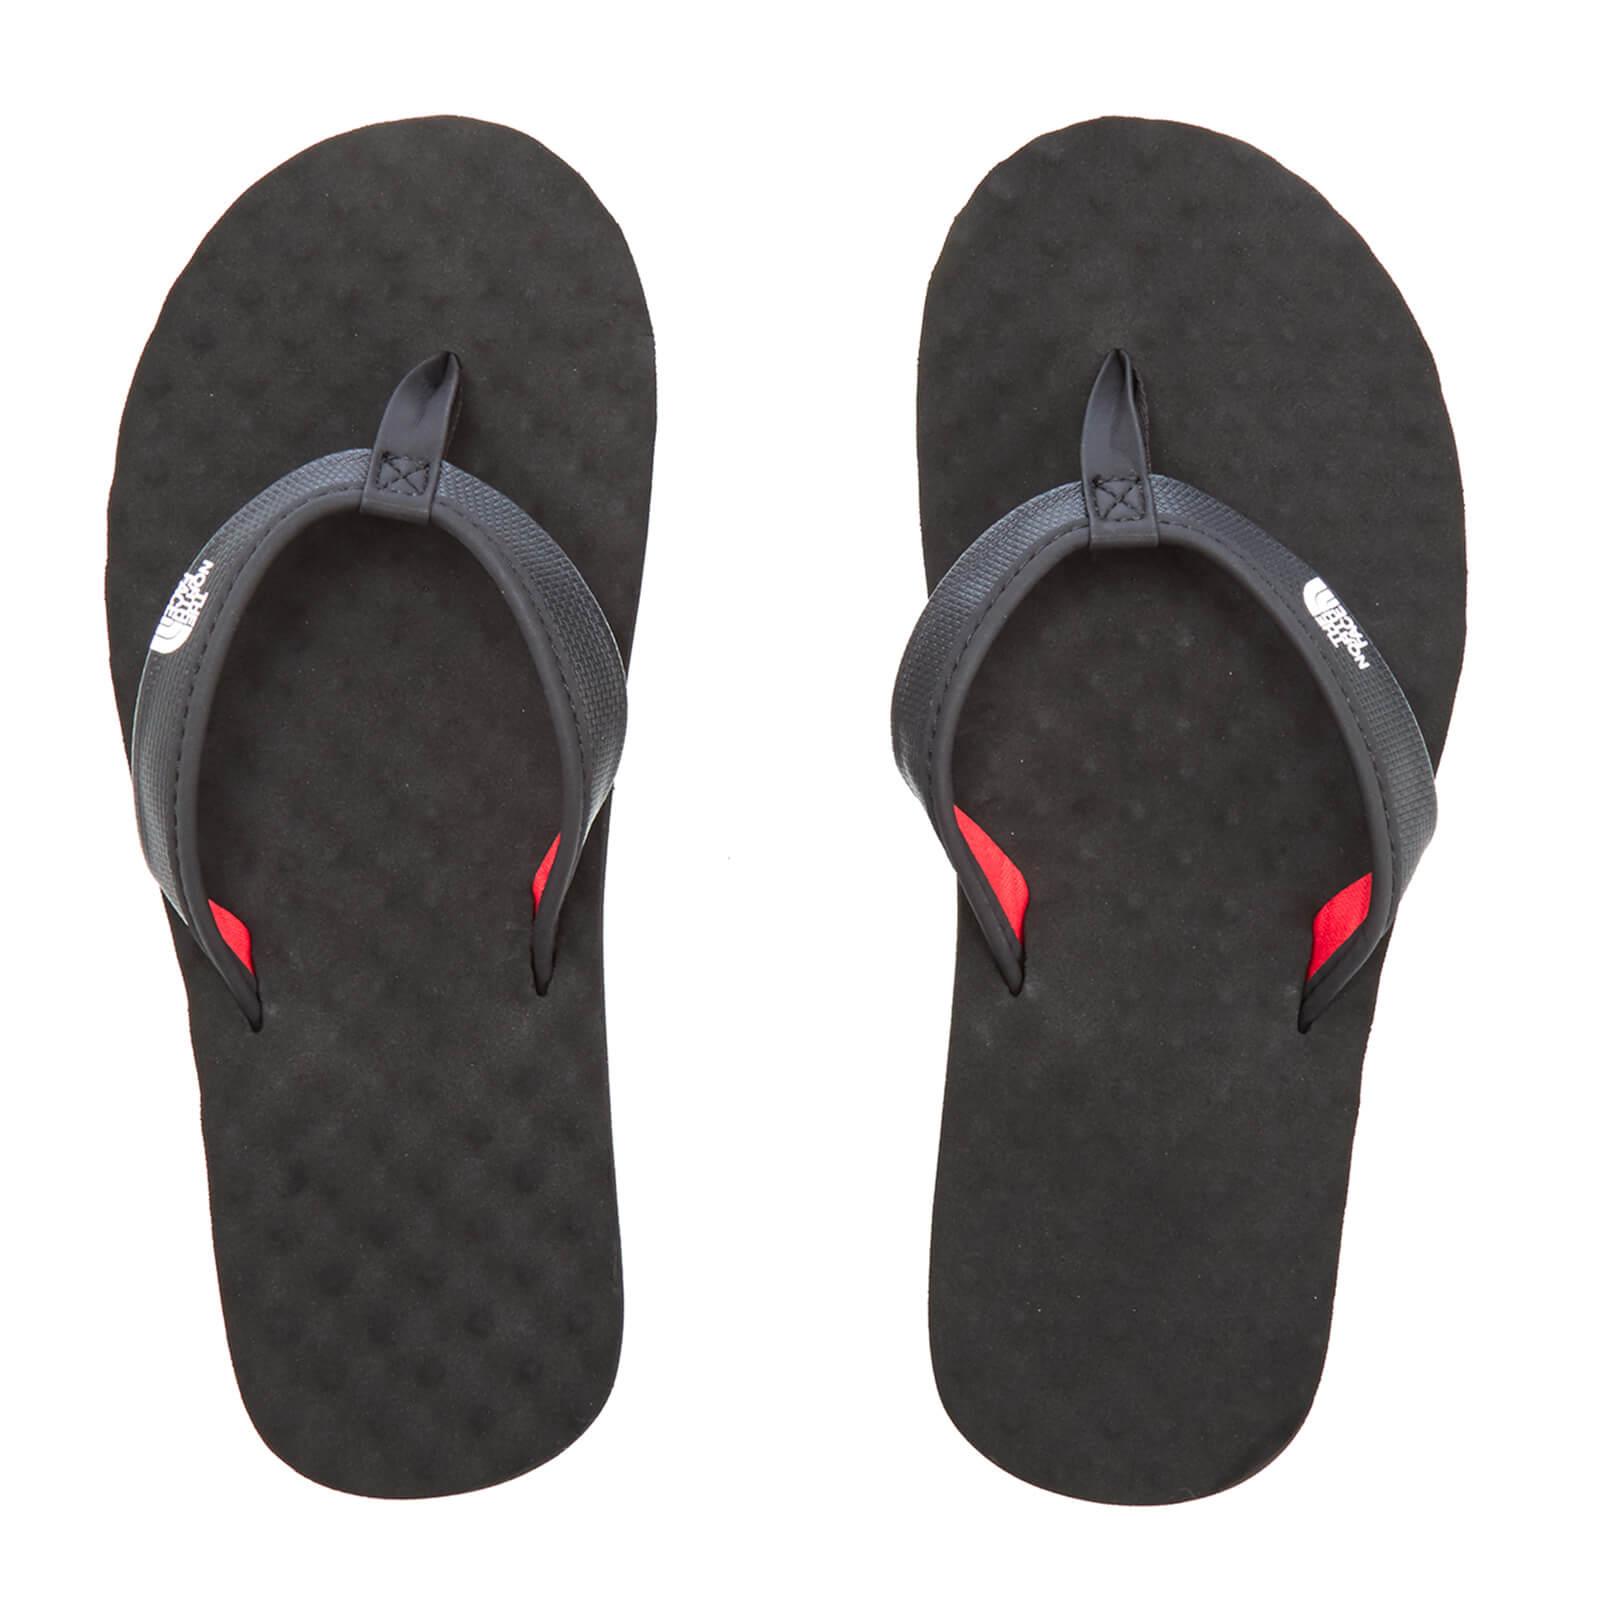 39579f484de0 The North Face Women s Base Camp Mini Flip Flops - TNF Black Womens  Accessories